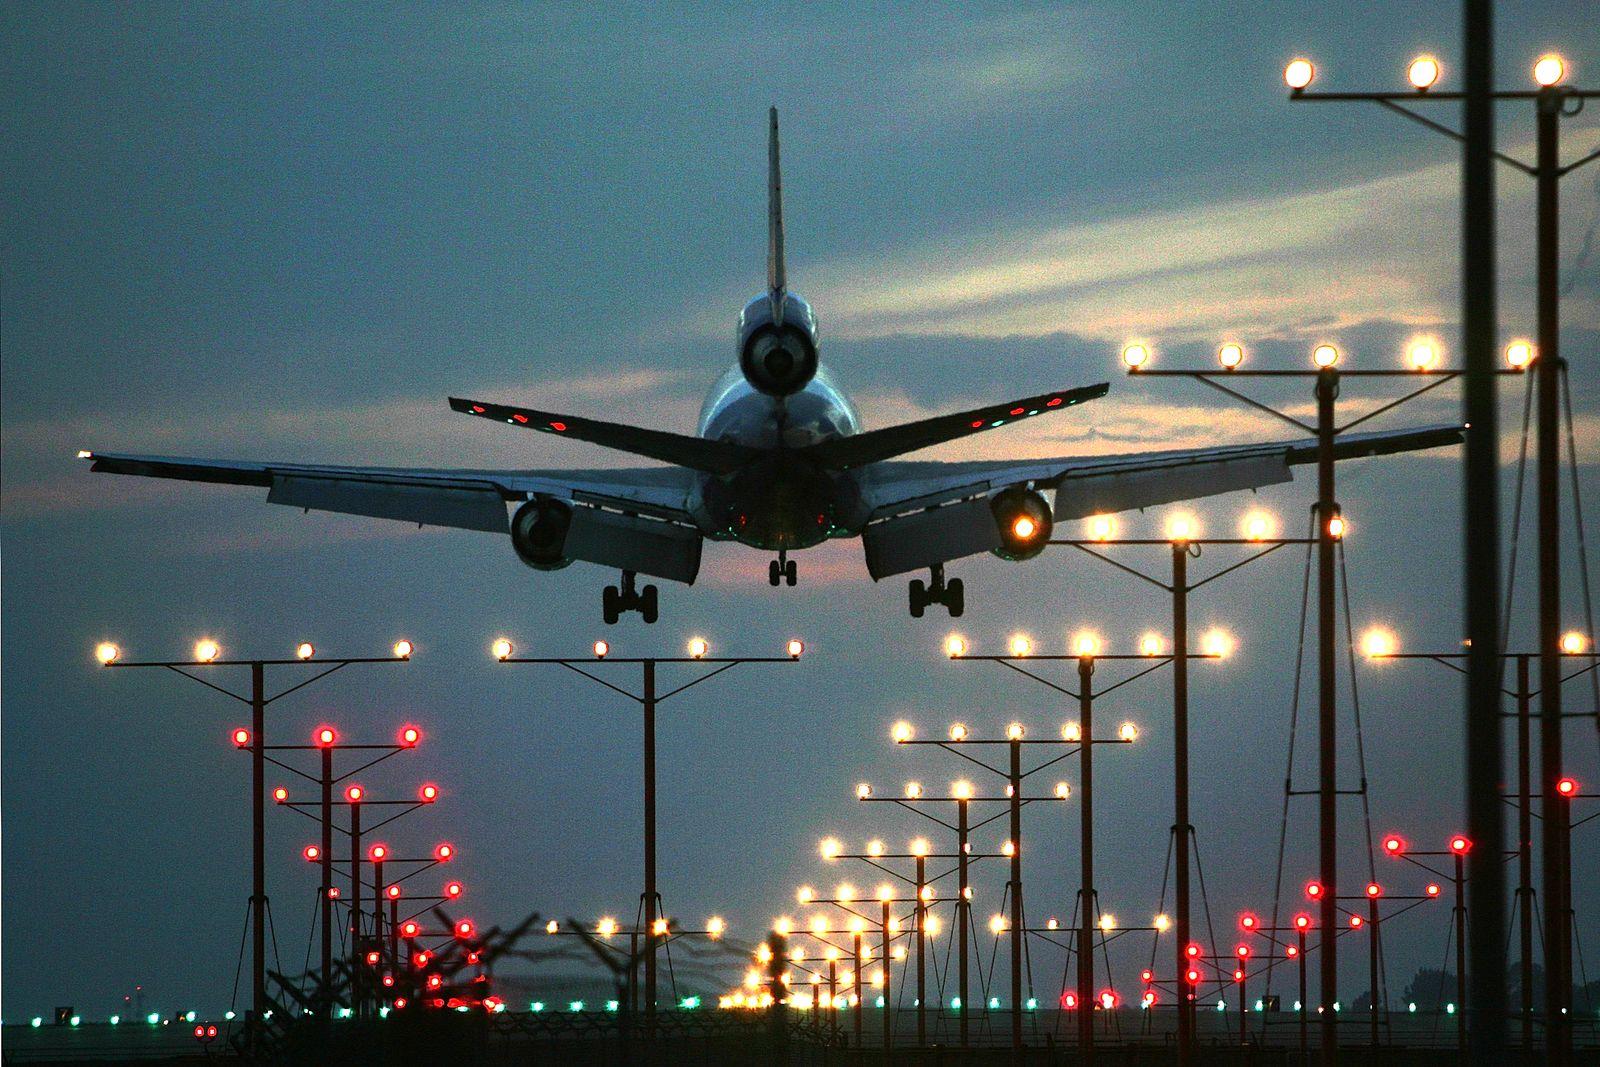 Flugzeug / Landung / Landebahn